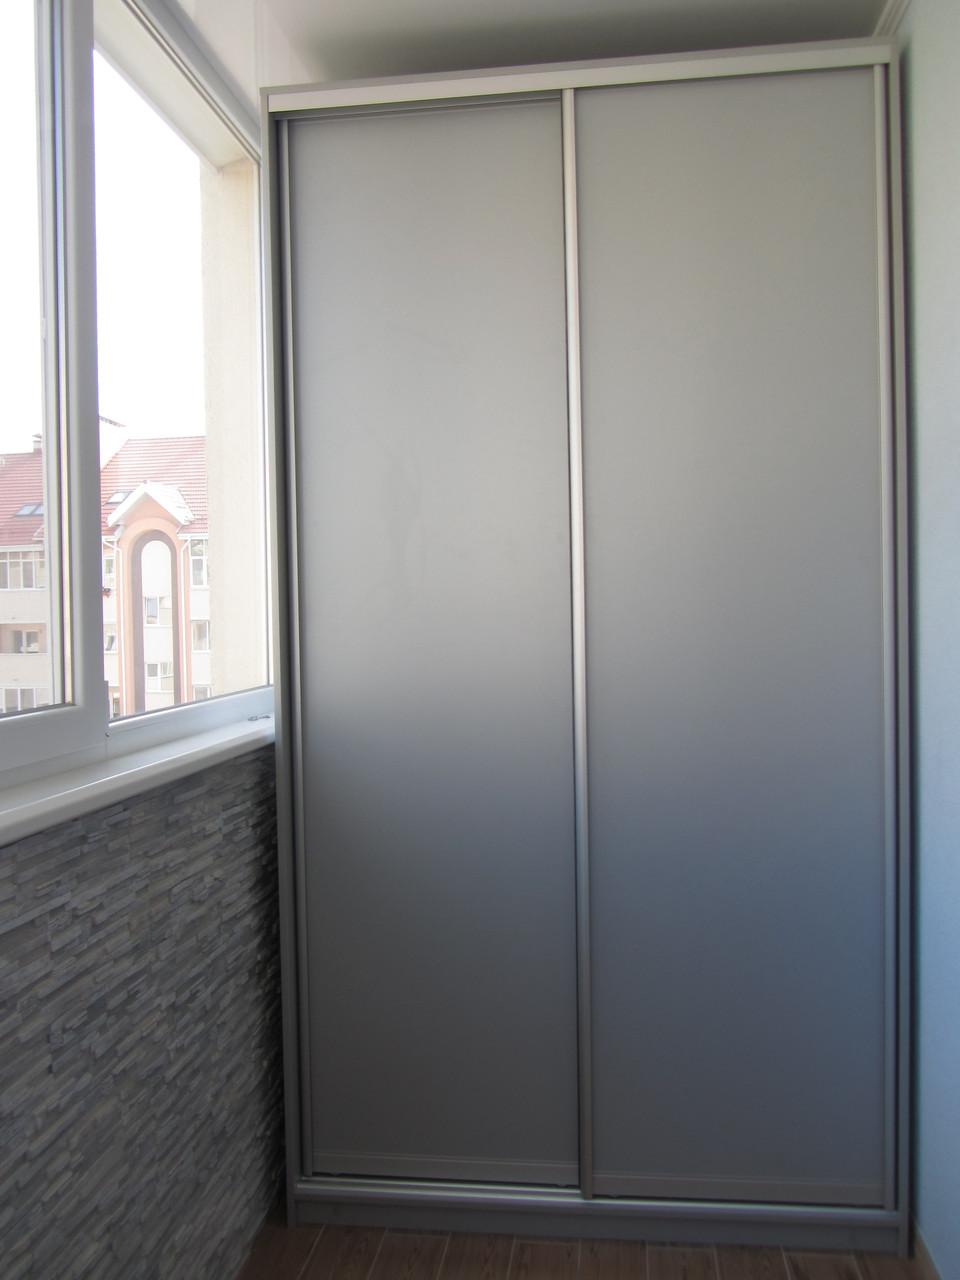 Шкаф купе на заказ на балкон z-126, цена, купить в киеве - p.